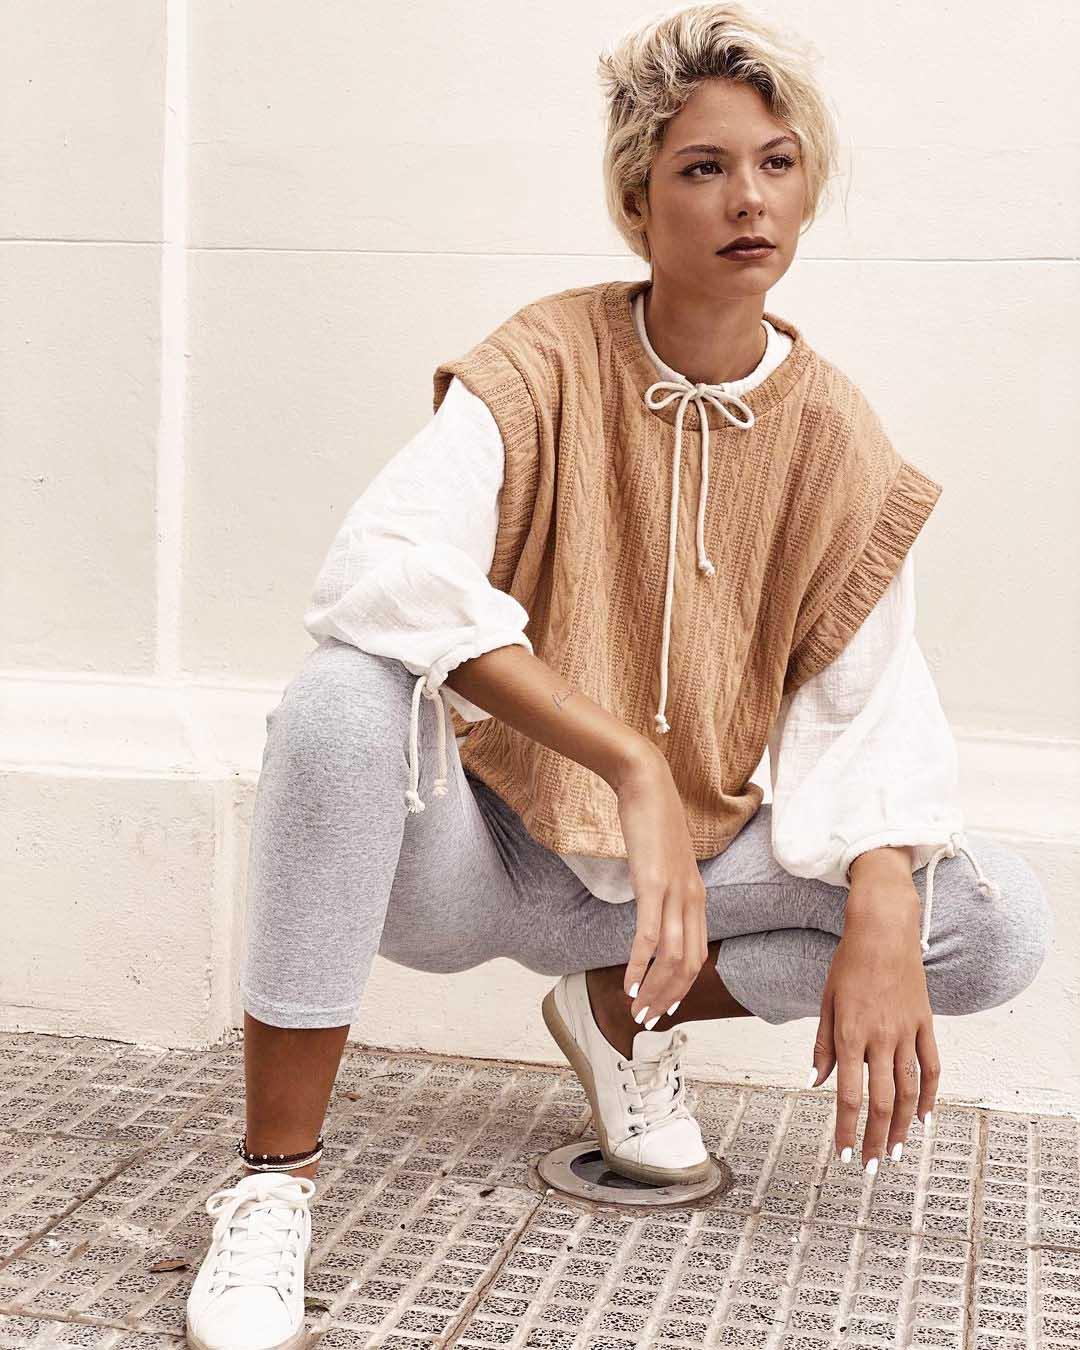 chaleco blusa y calza invierno 2021 mujer ropa de moda 2021